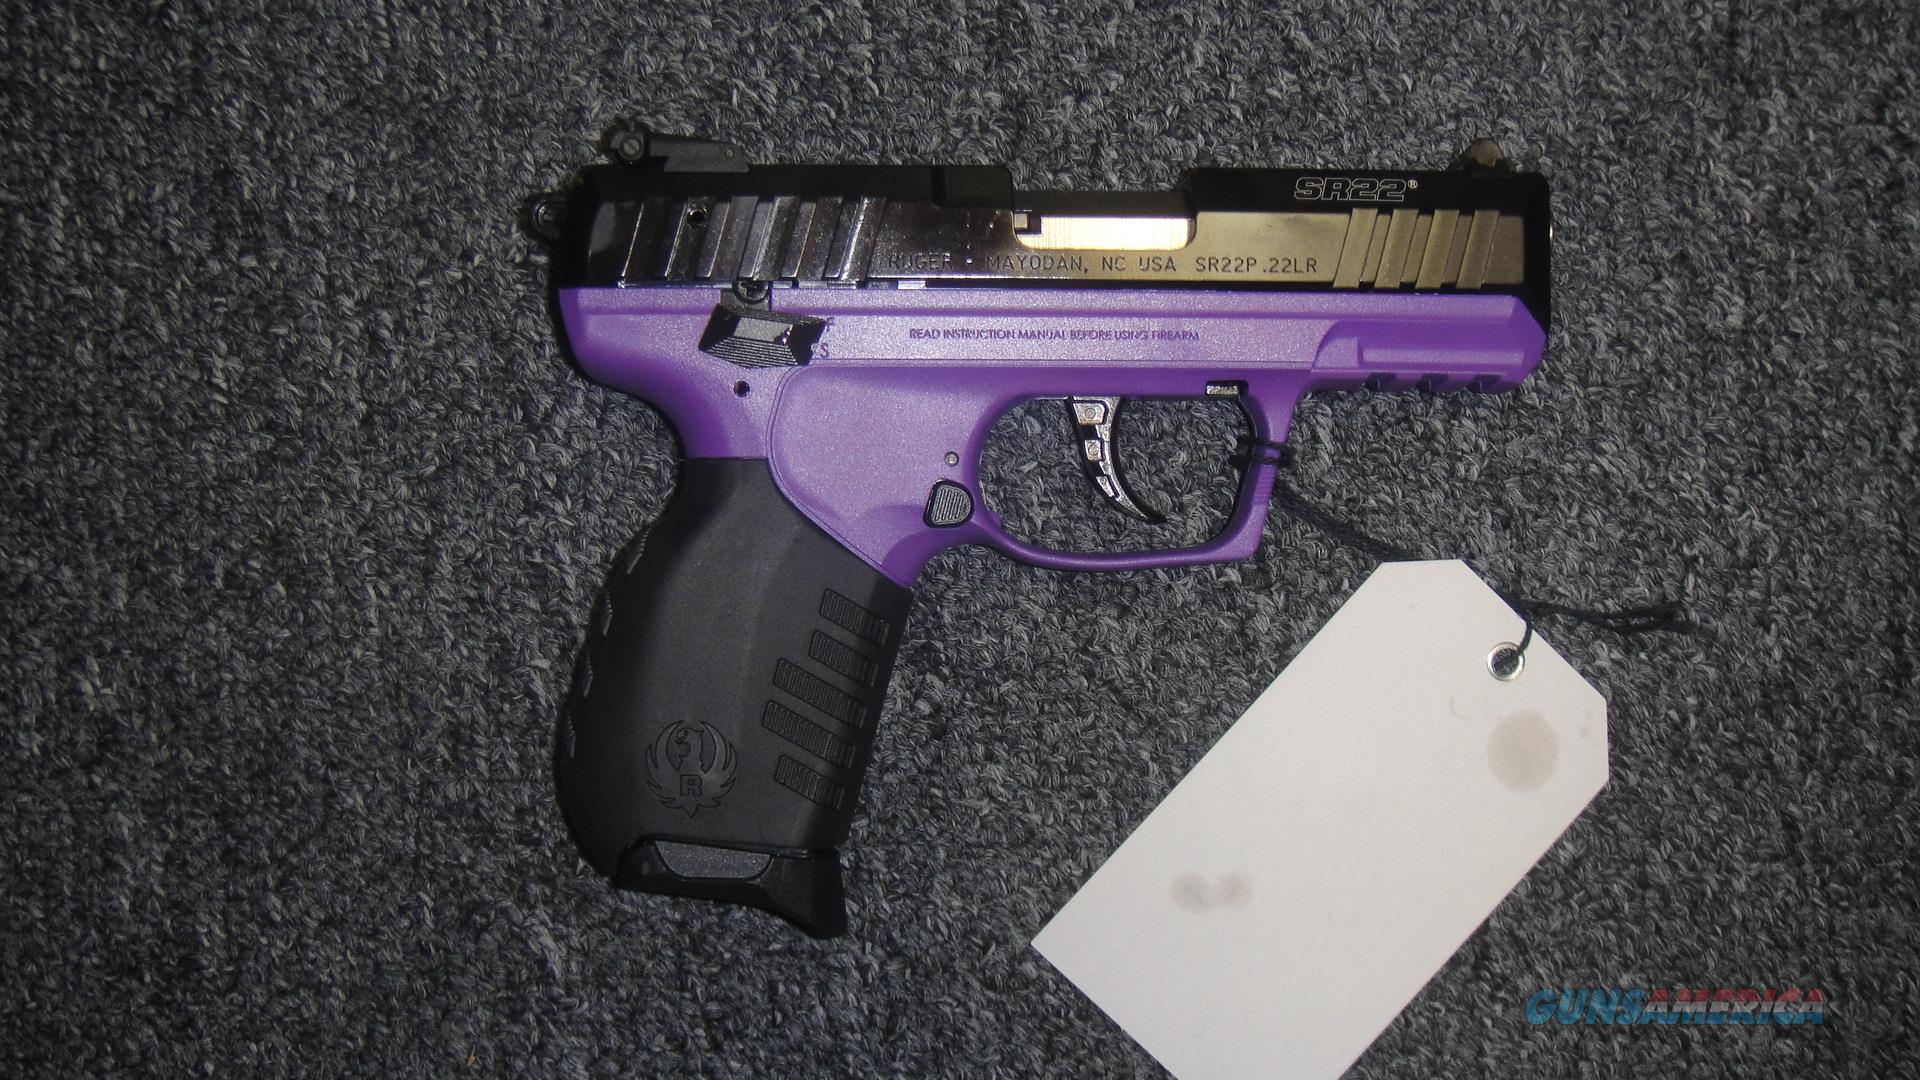 Ruger SR22 w/ Purple Frame  Guns > Pistols > Ruger Semi-Auto Pistols > SR Family > SR22